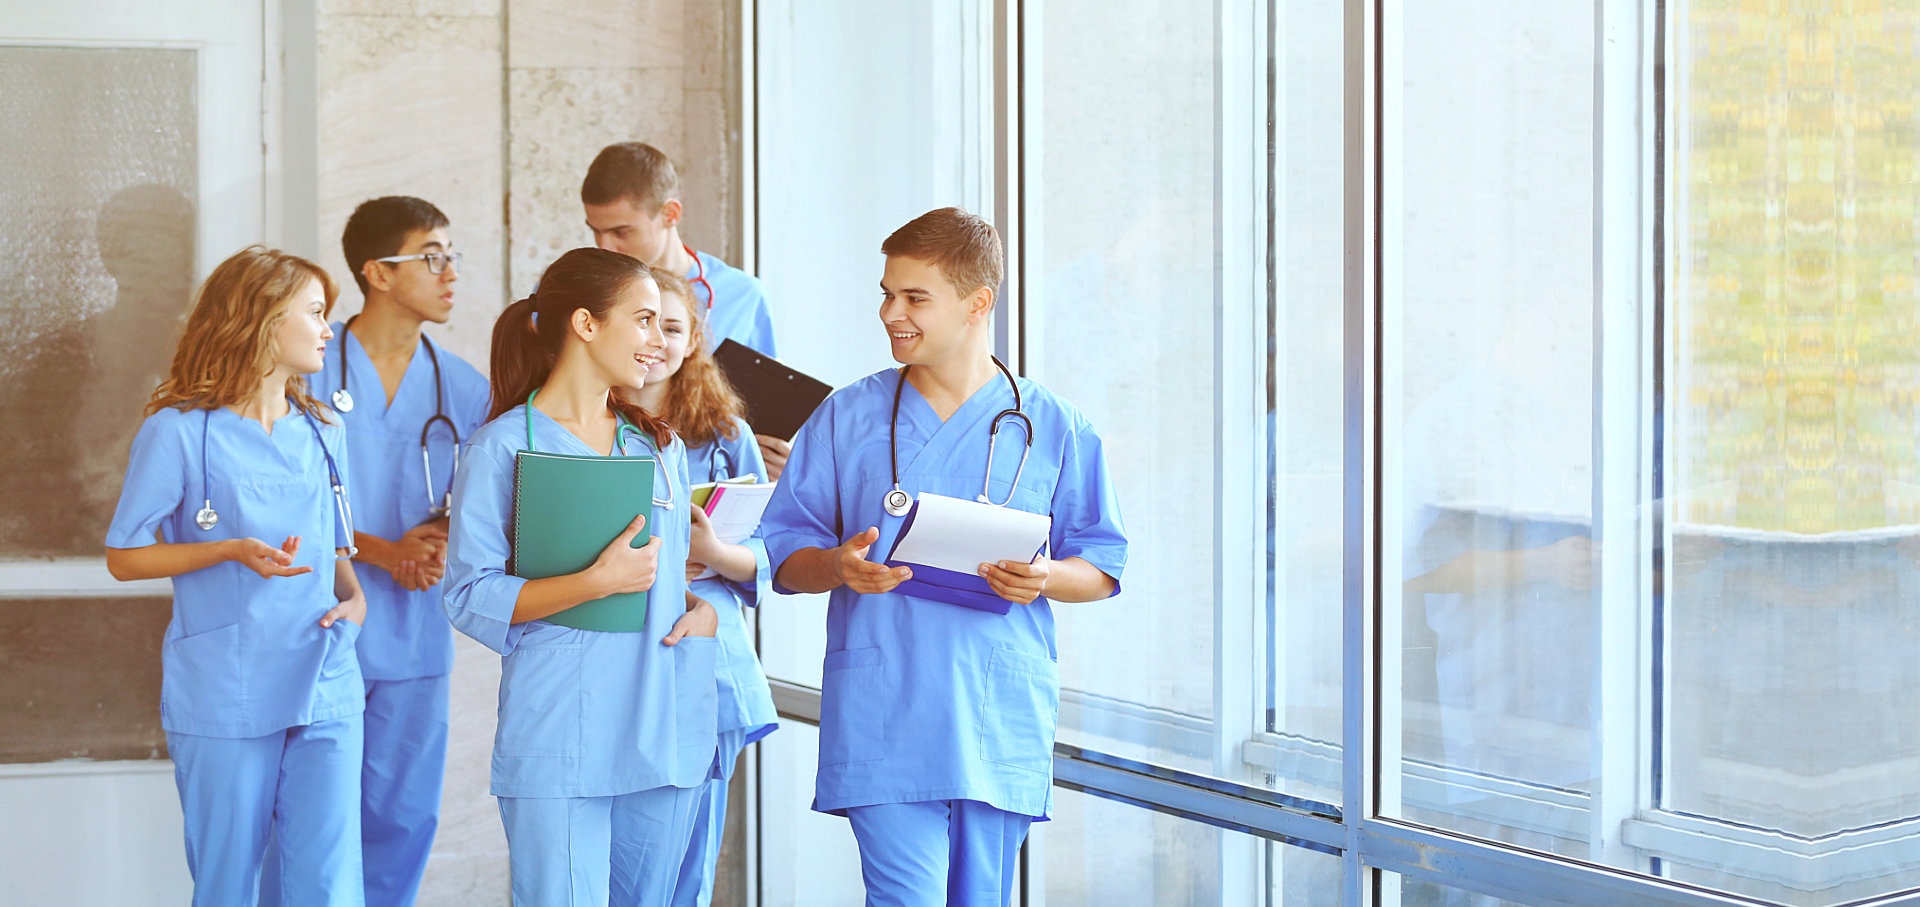 nurses walking and smiling together